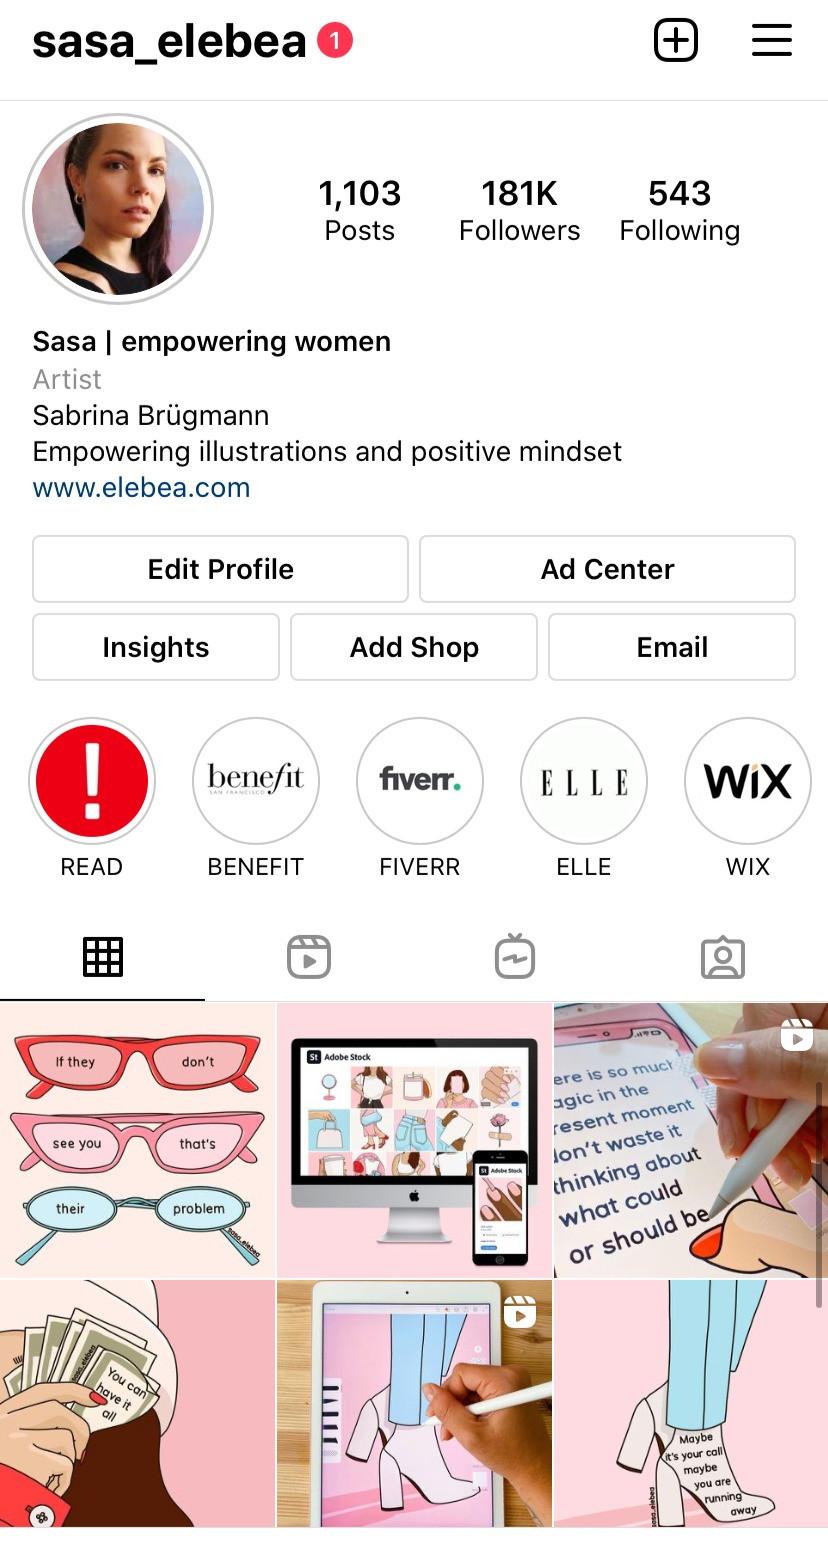 Instagram Sasa Elebea